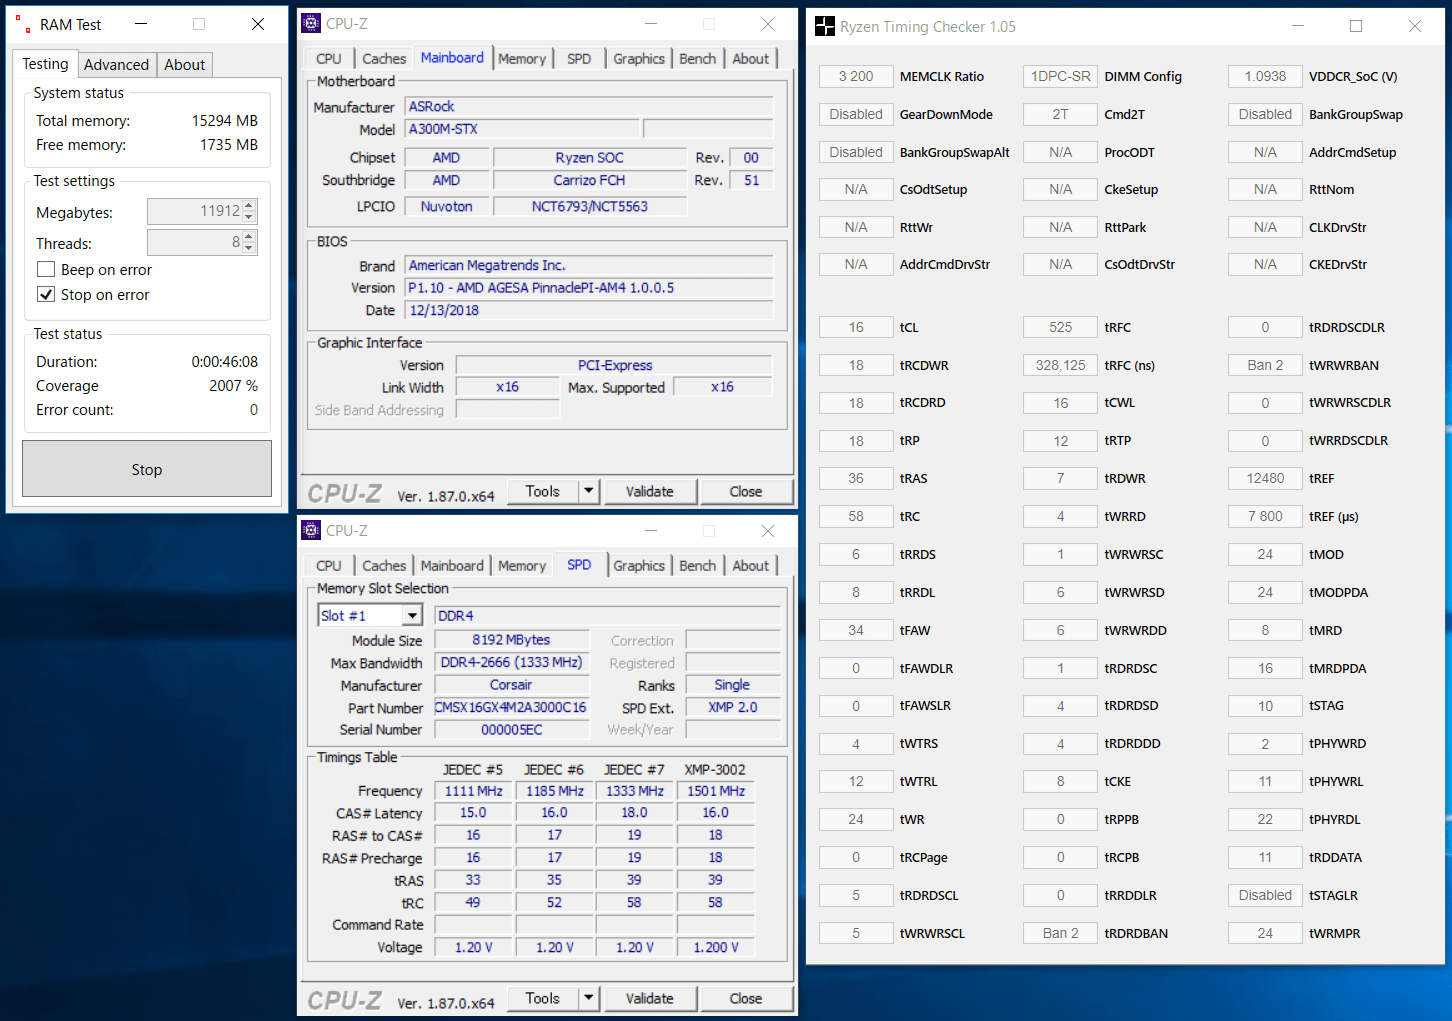 Ryzen 5 2400G_CMSX16GX4M2A3000C16